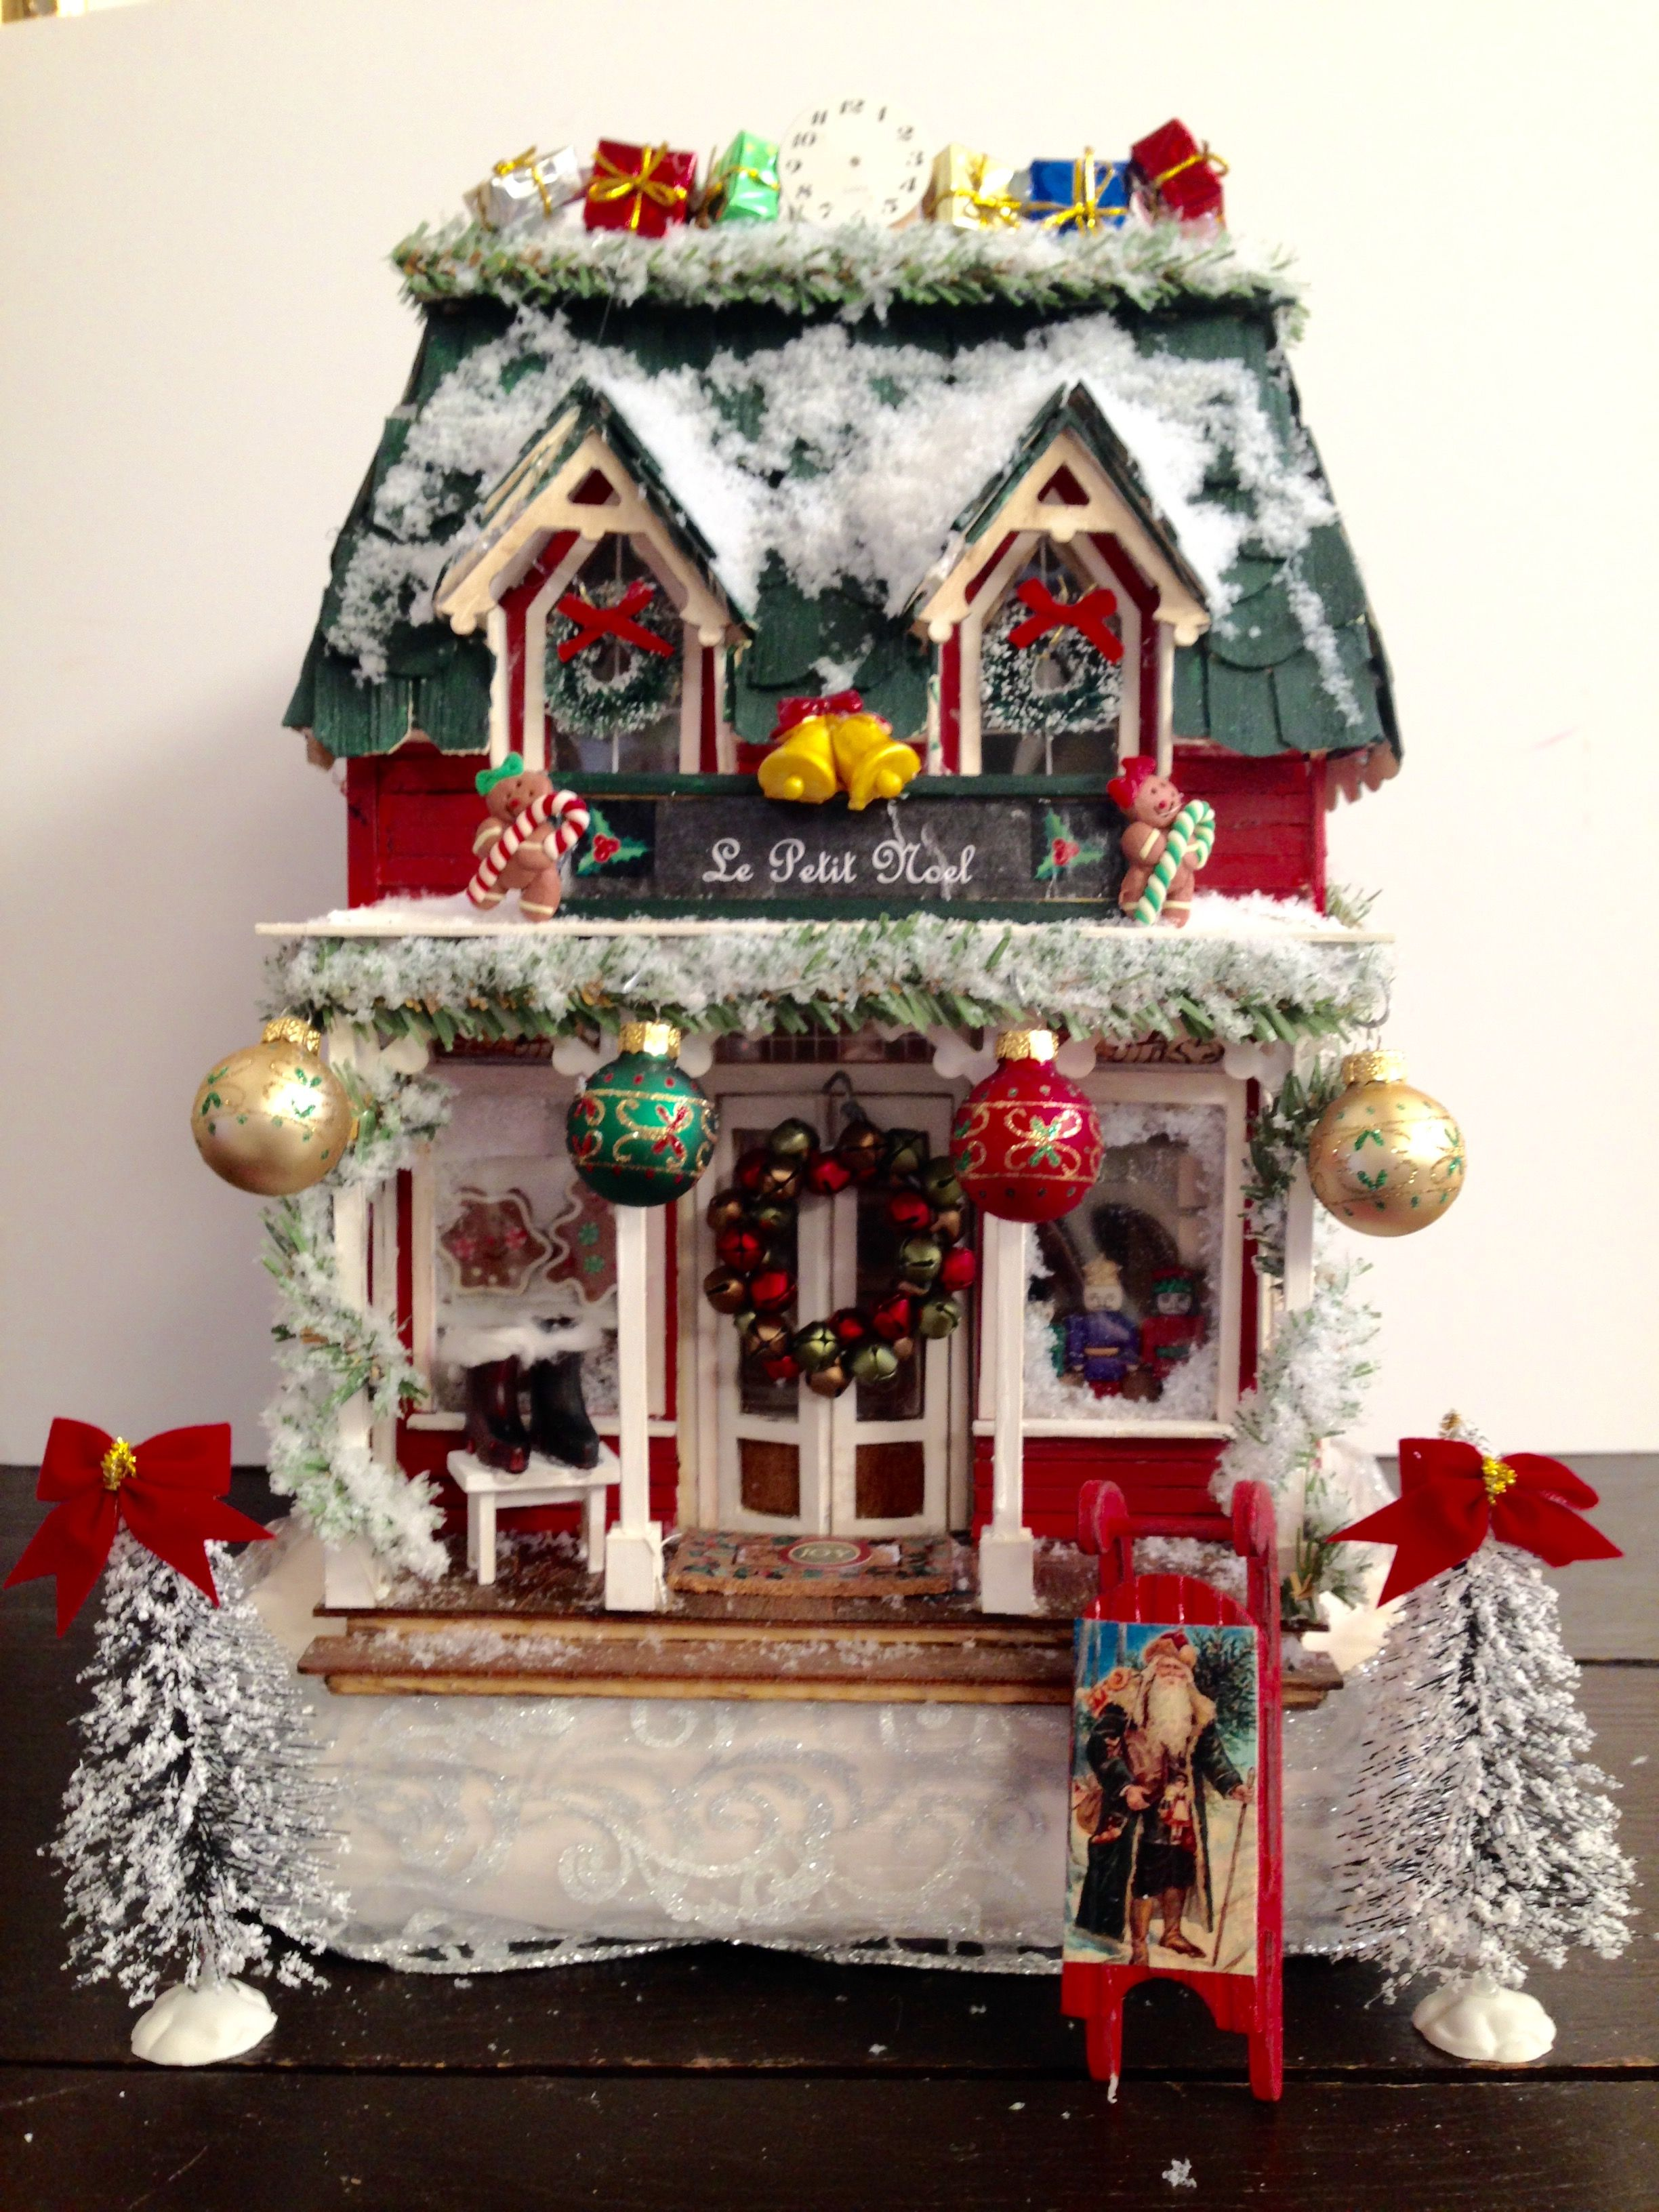 le petit noel christmas shoppe made from the greenleaf brimbles mercantile kit miniature christmas shop - Noel Christmas Store